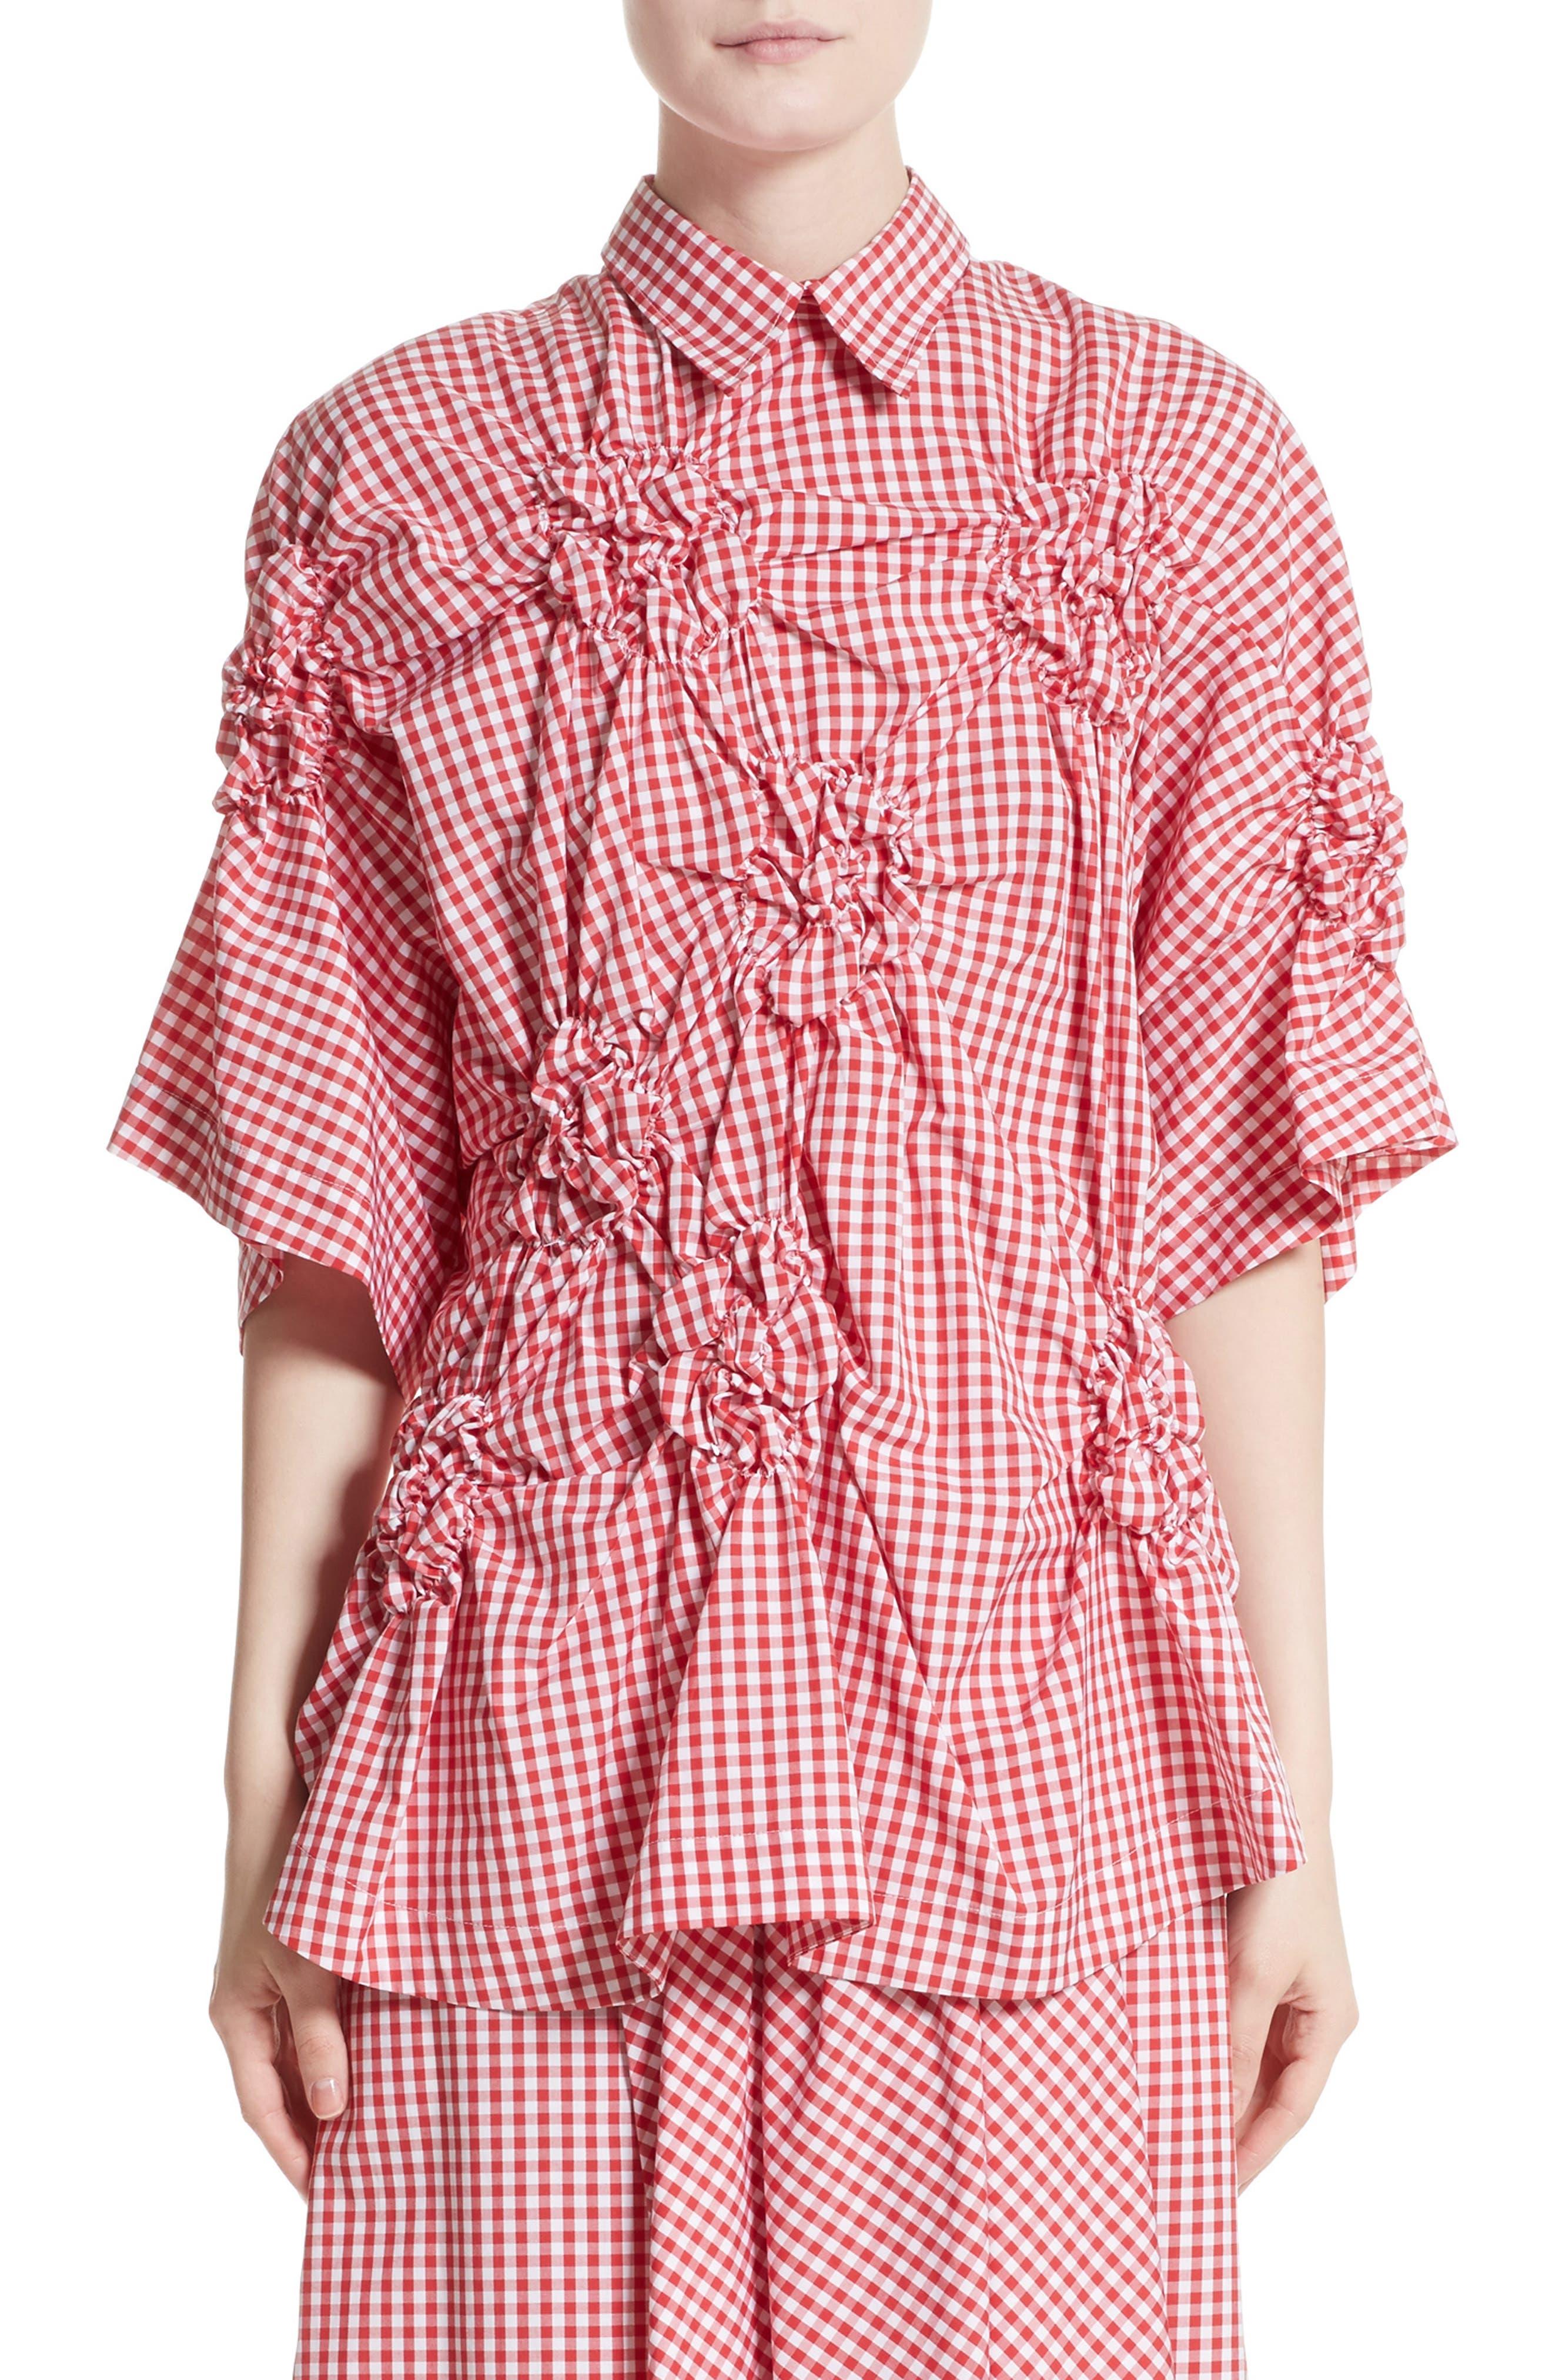 SIMONE ROCHA Floral Smocked Gingham Shirt